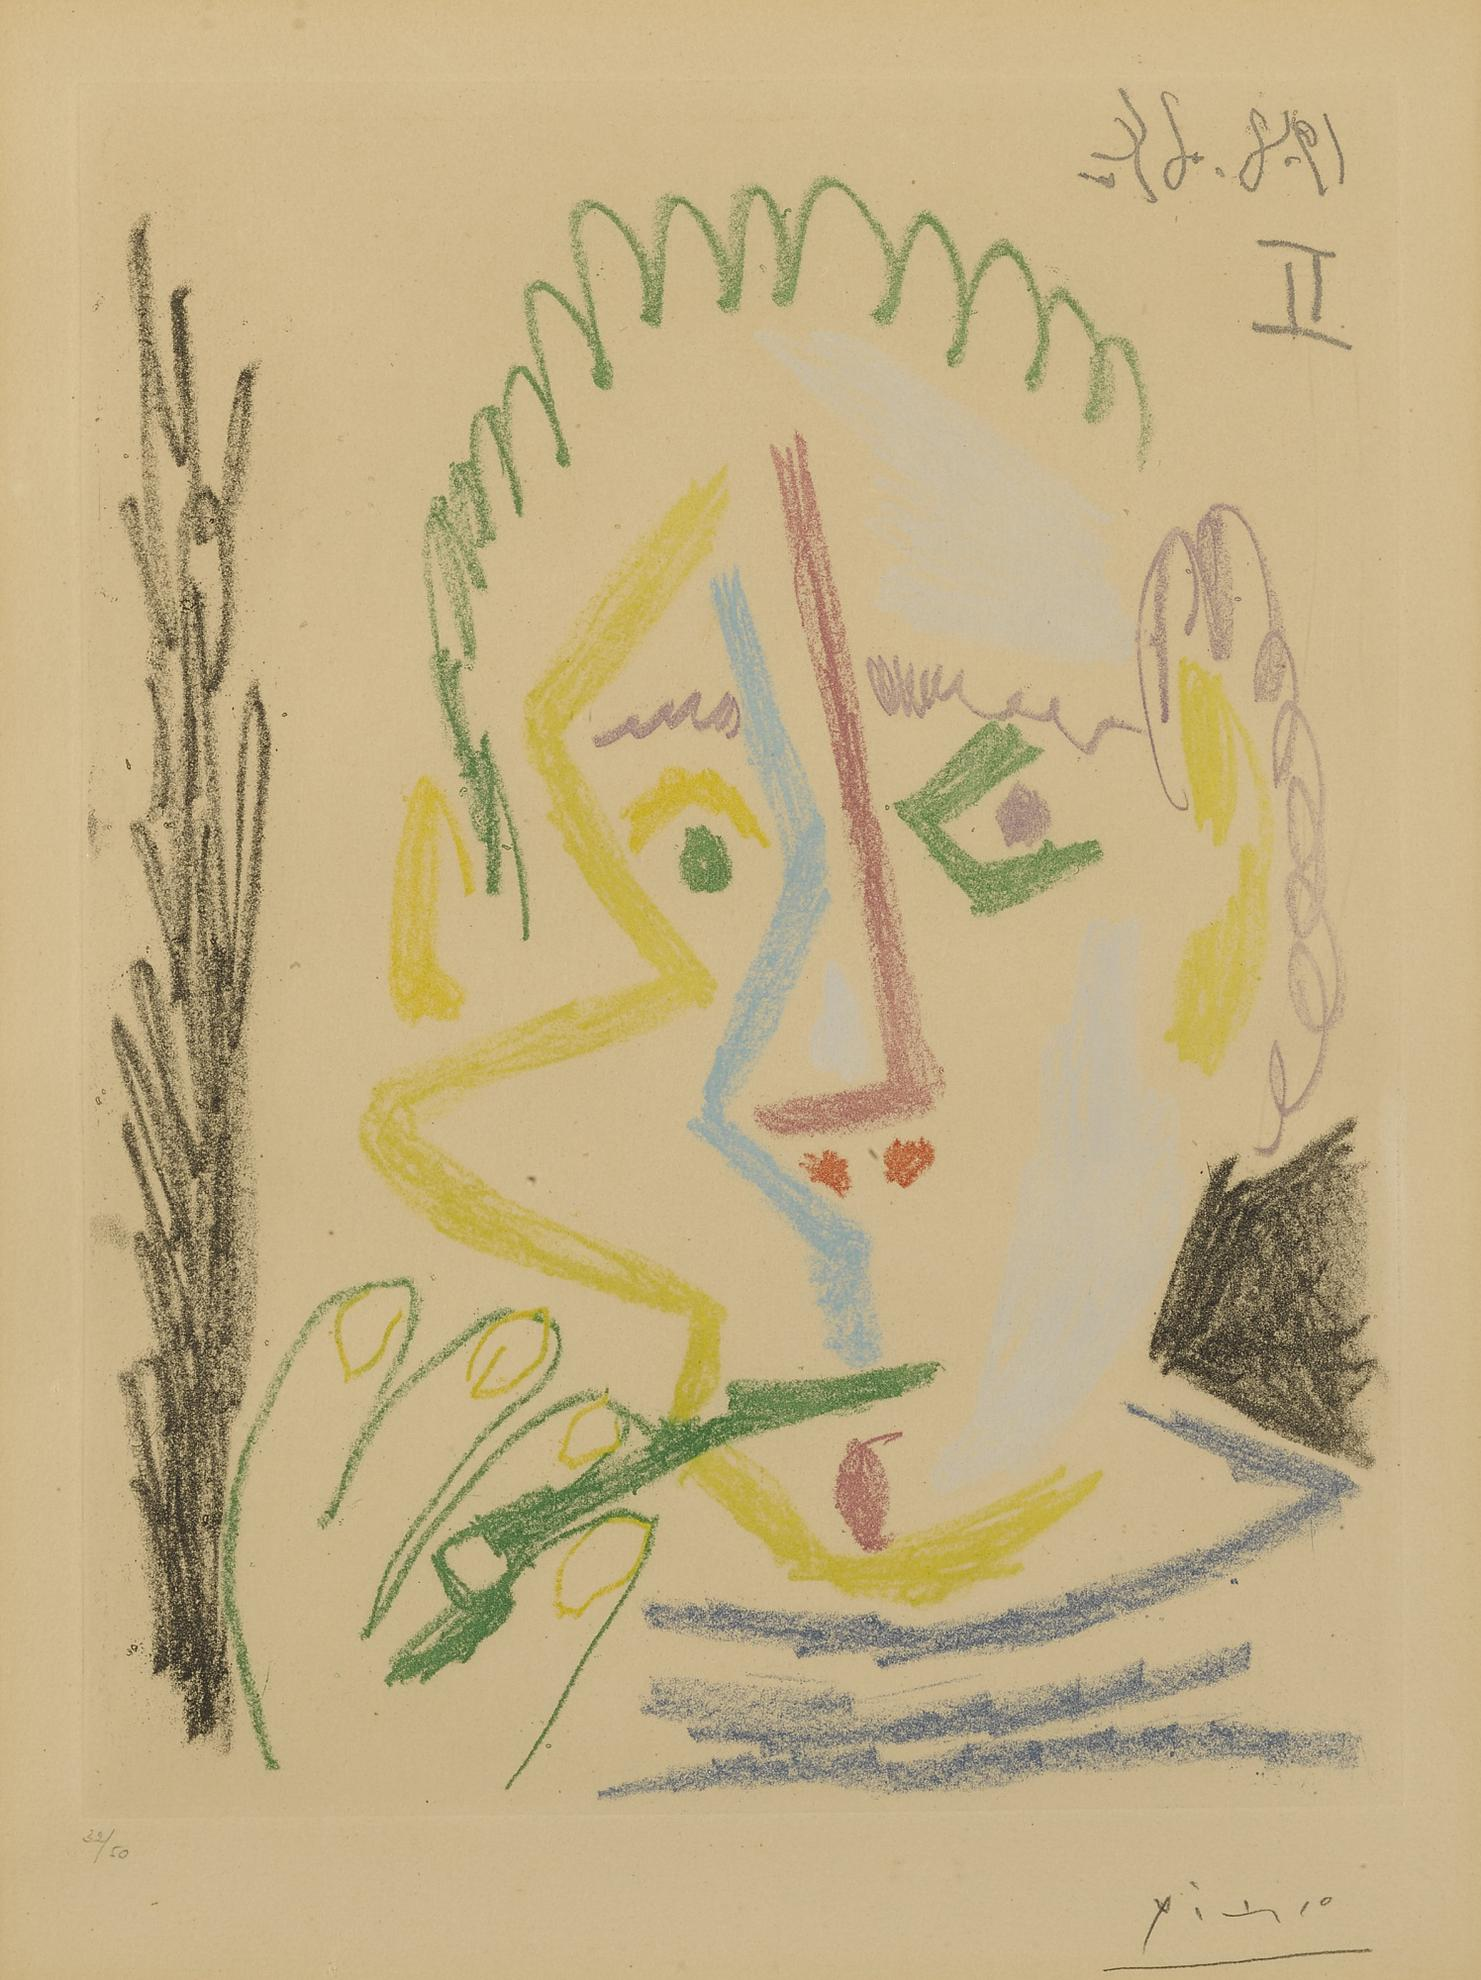 Pablo Picasso-Fumeur. I (B. 1165; Ba. 1165)-1964